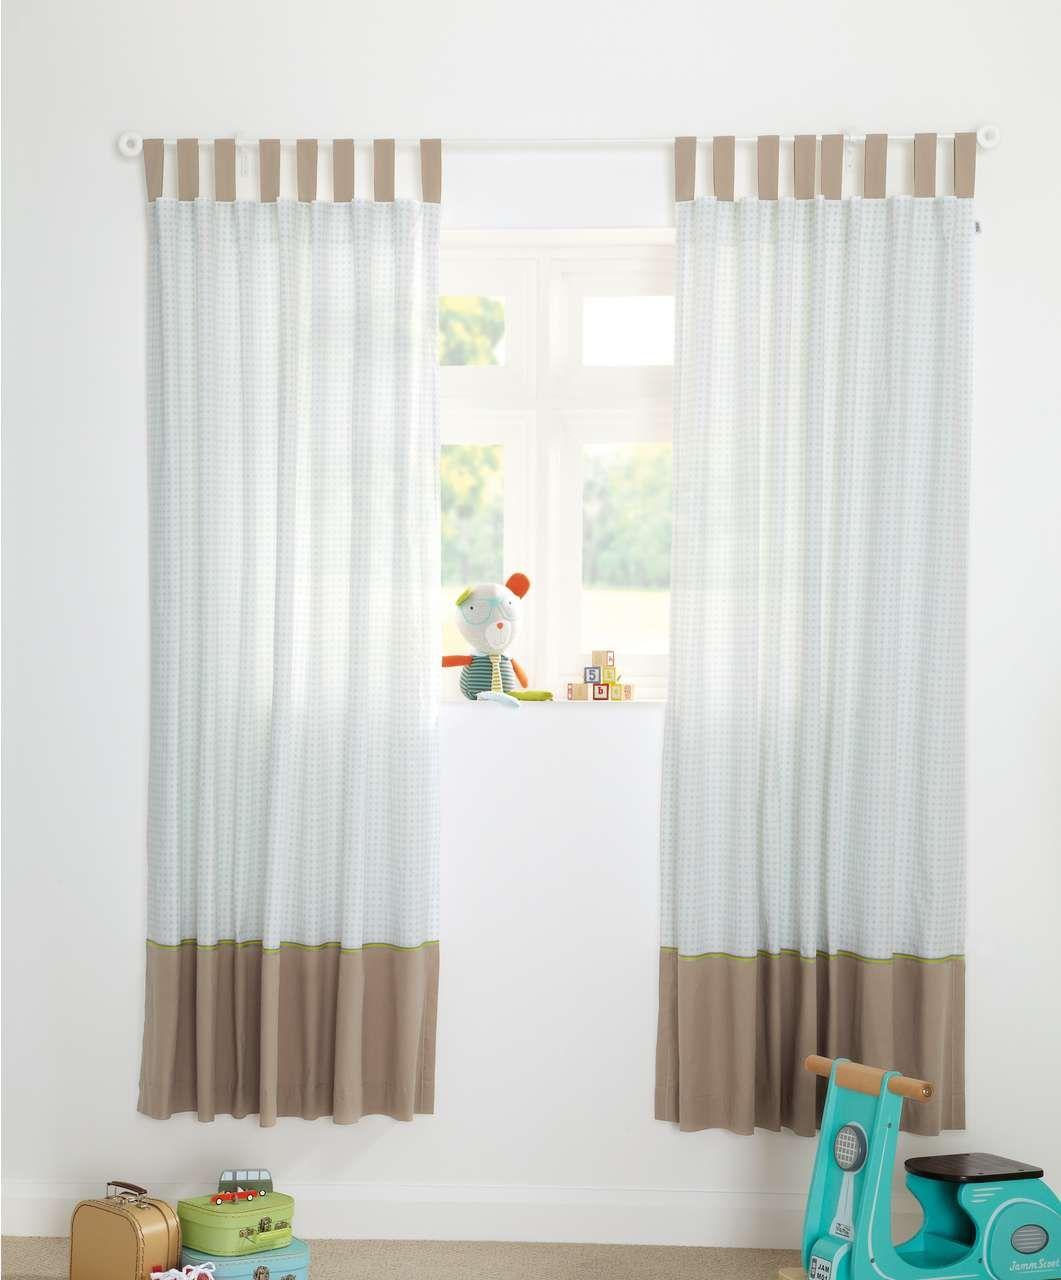 Pixie & Finch - Boys Curtains (132 x 160cm) - Curtains & Tie Backs - Mamas & Papas